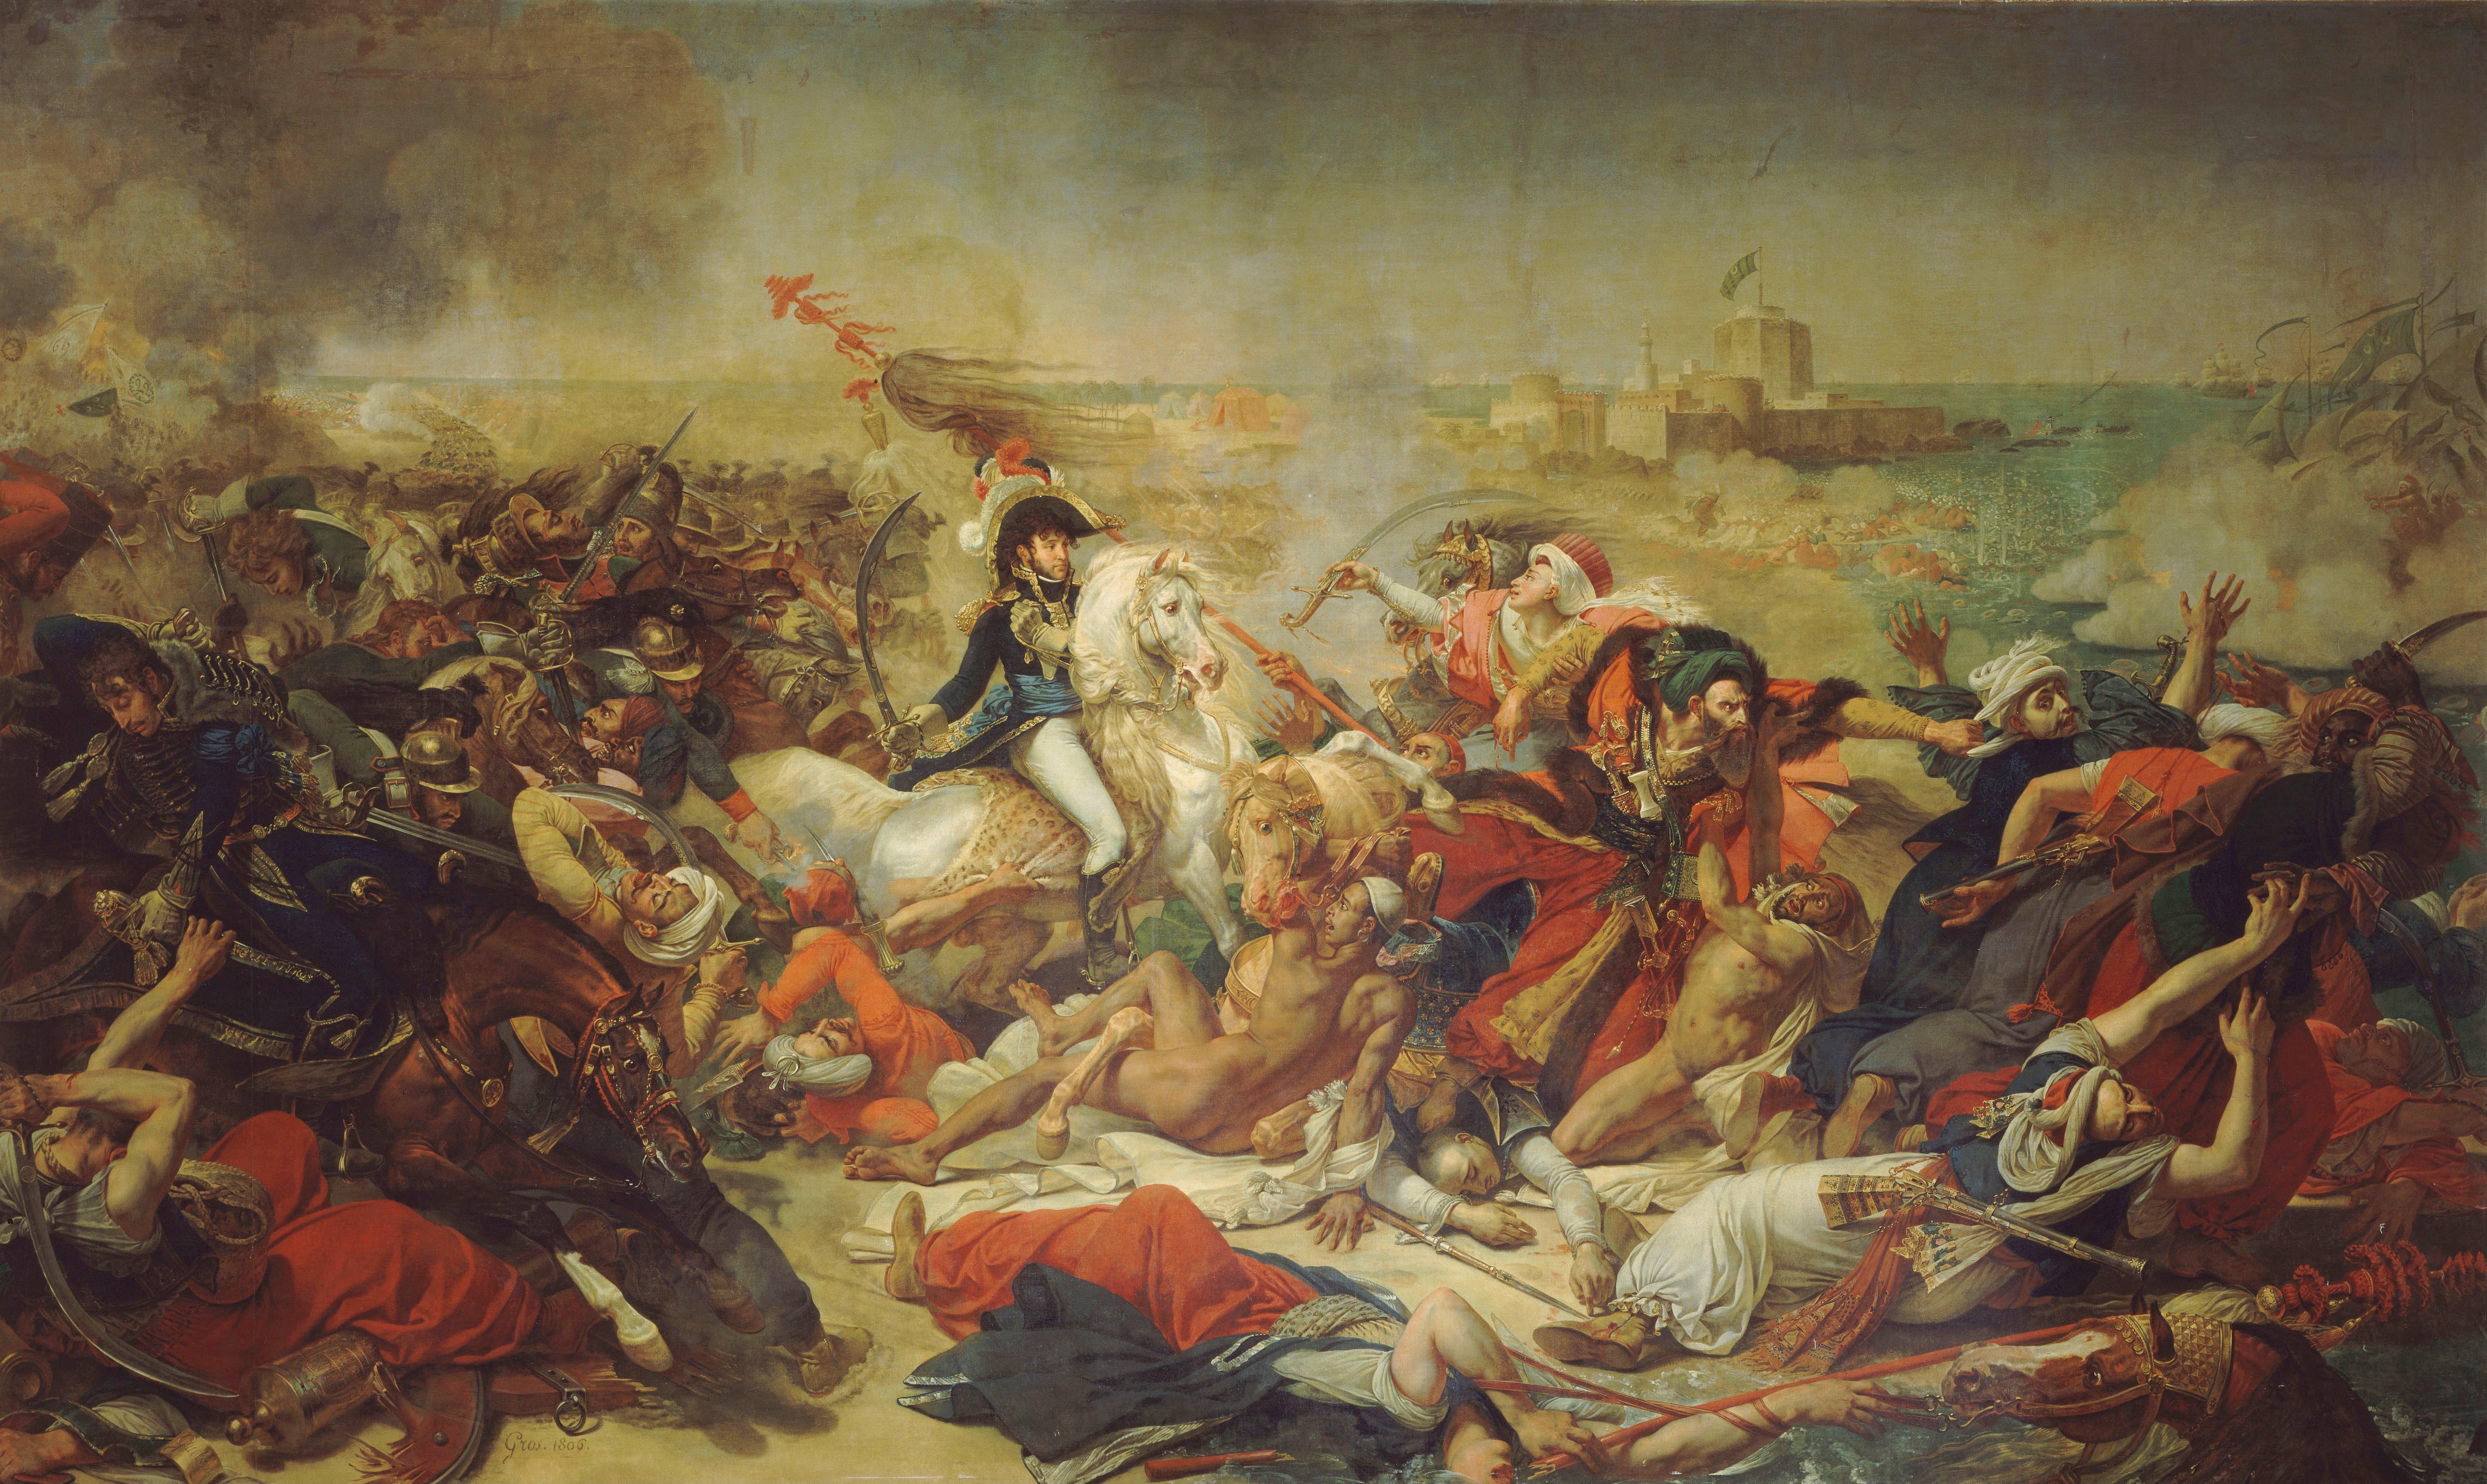 Antoine-Jean_Gros_-_Bataille_d'Aboukir,_25_juillet_1799_-_Google_Art_Project